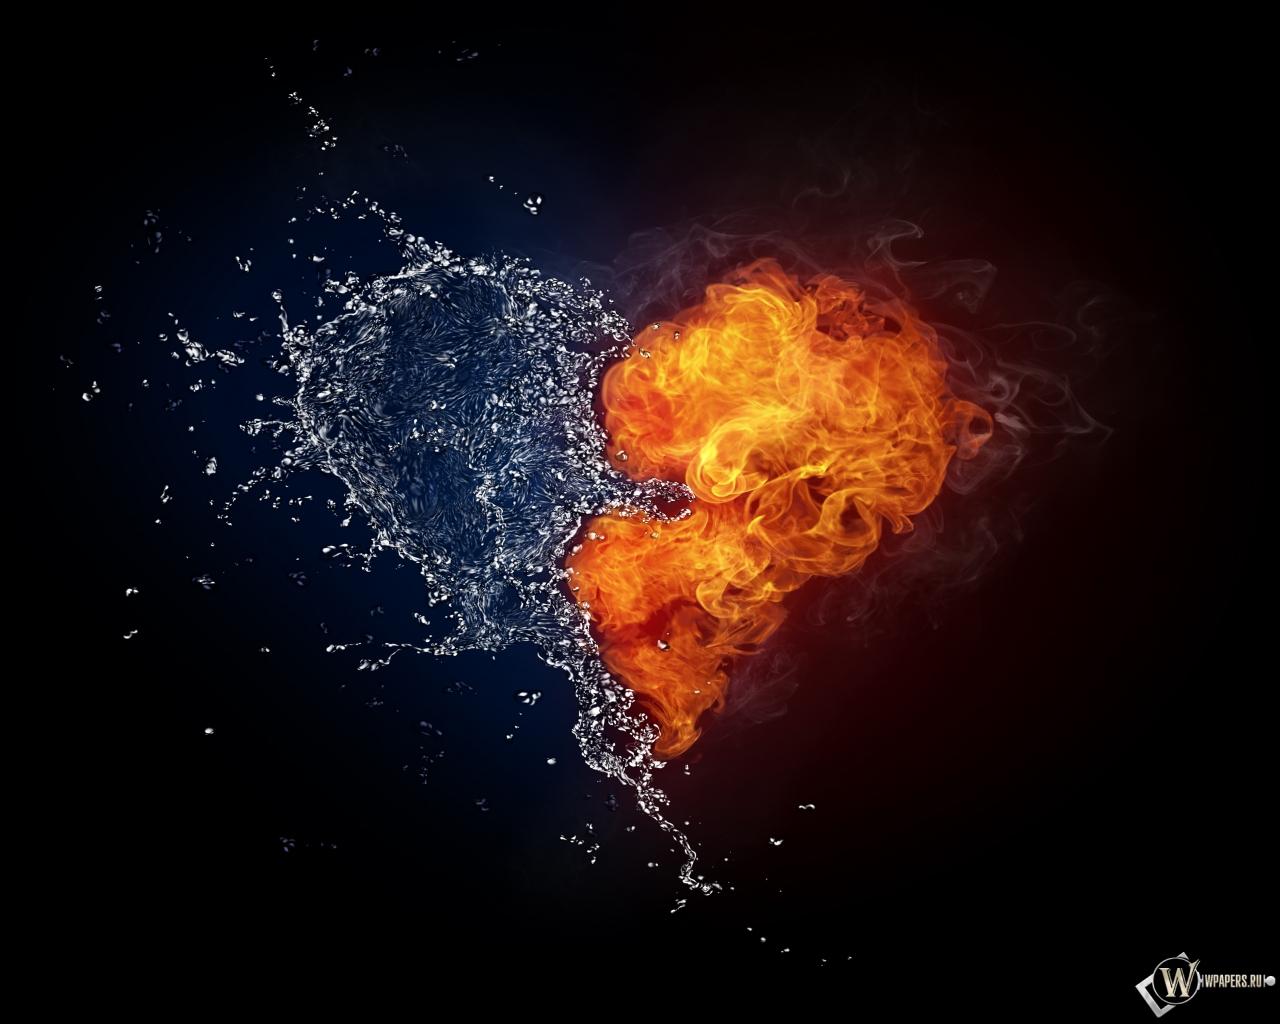 http://wpapers.ru/wallpapers/Moods/7762/1280x1024_Сердце-из-огня-и-воды.jpg